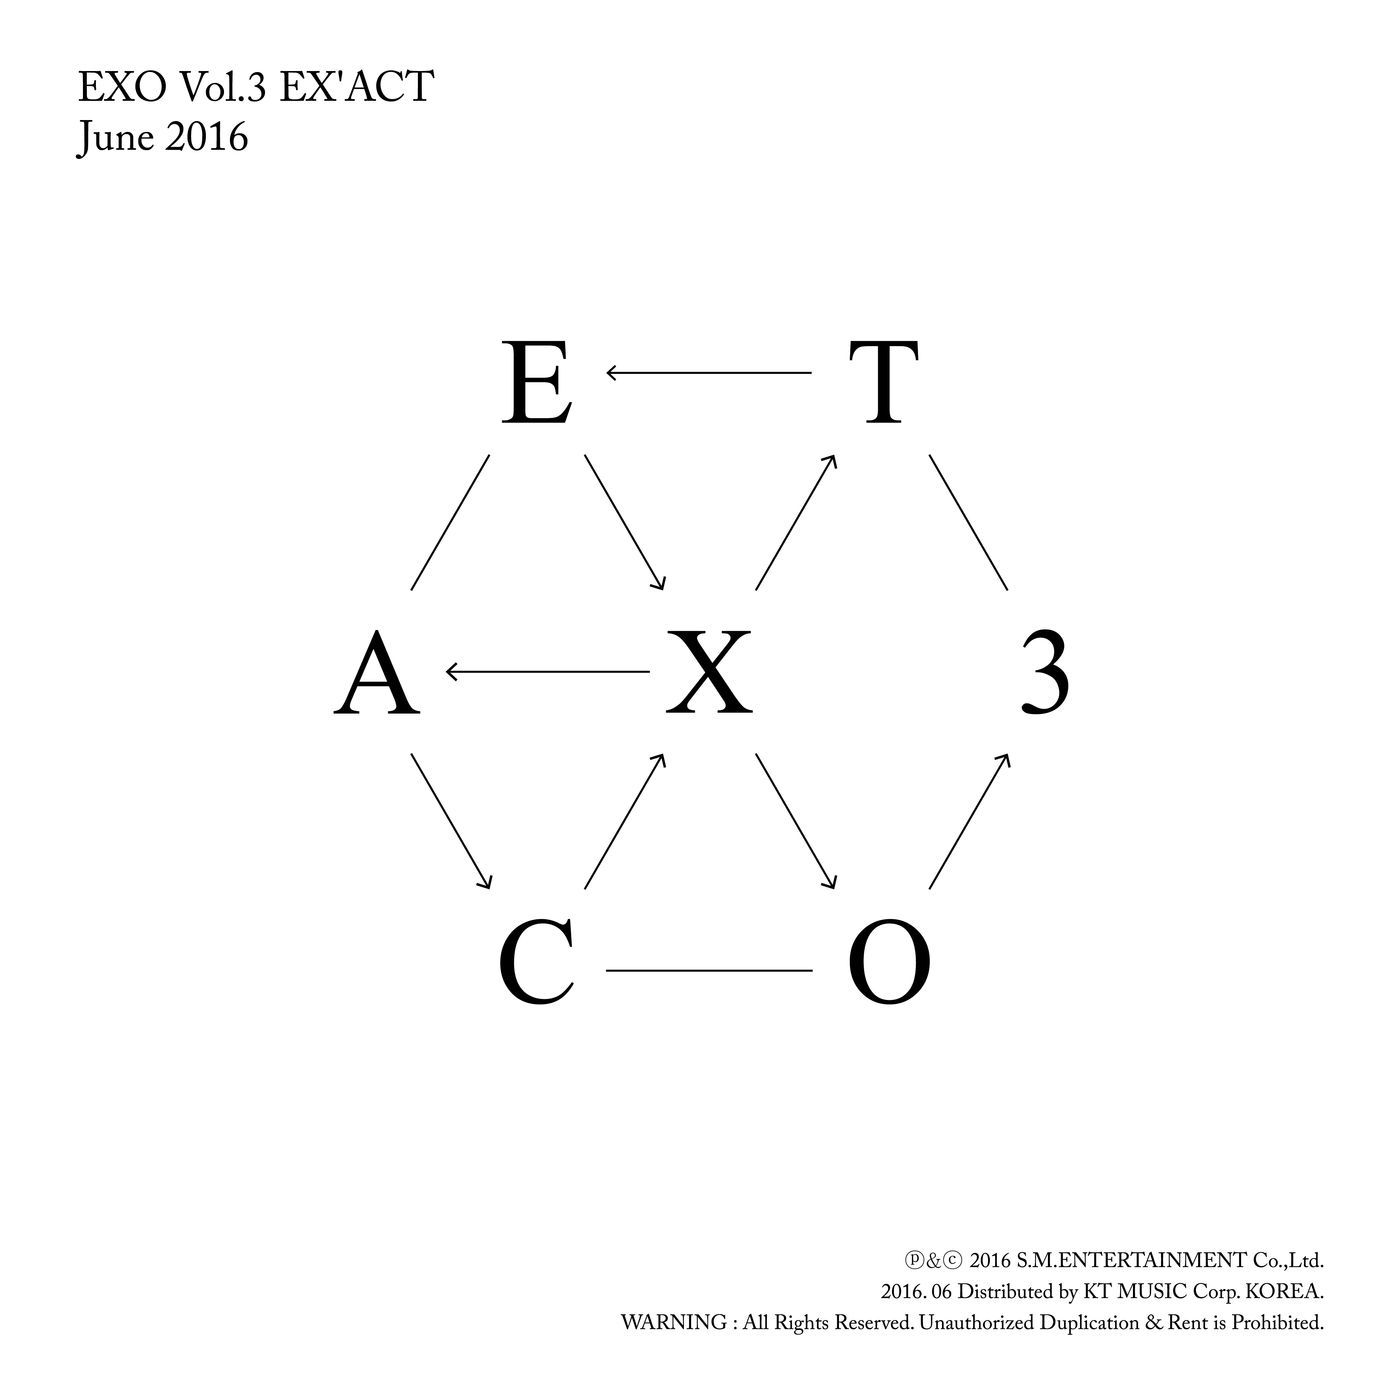 EXO - EX'ACT (Full 3rd Album) - Lucky One + MV K2Ost free mp3 download korean song kpop kdrama ost lyric 320 kbps